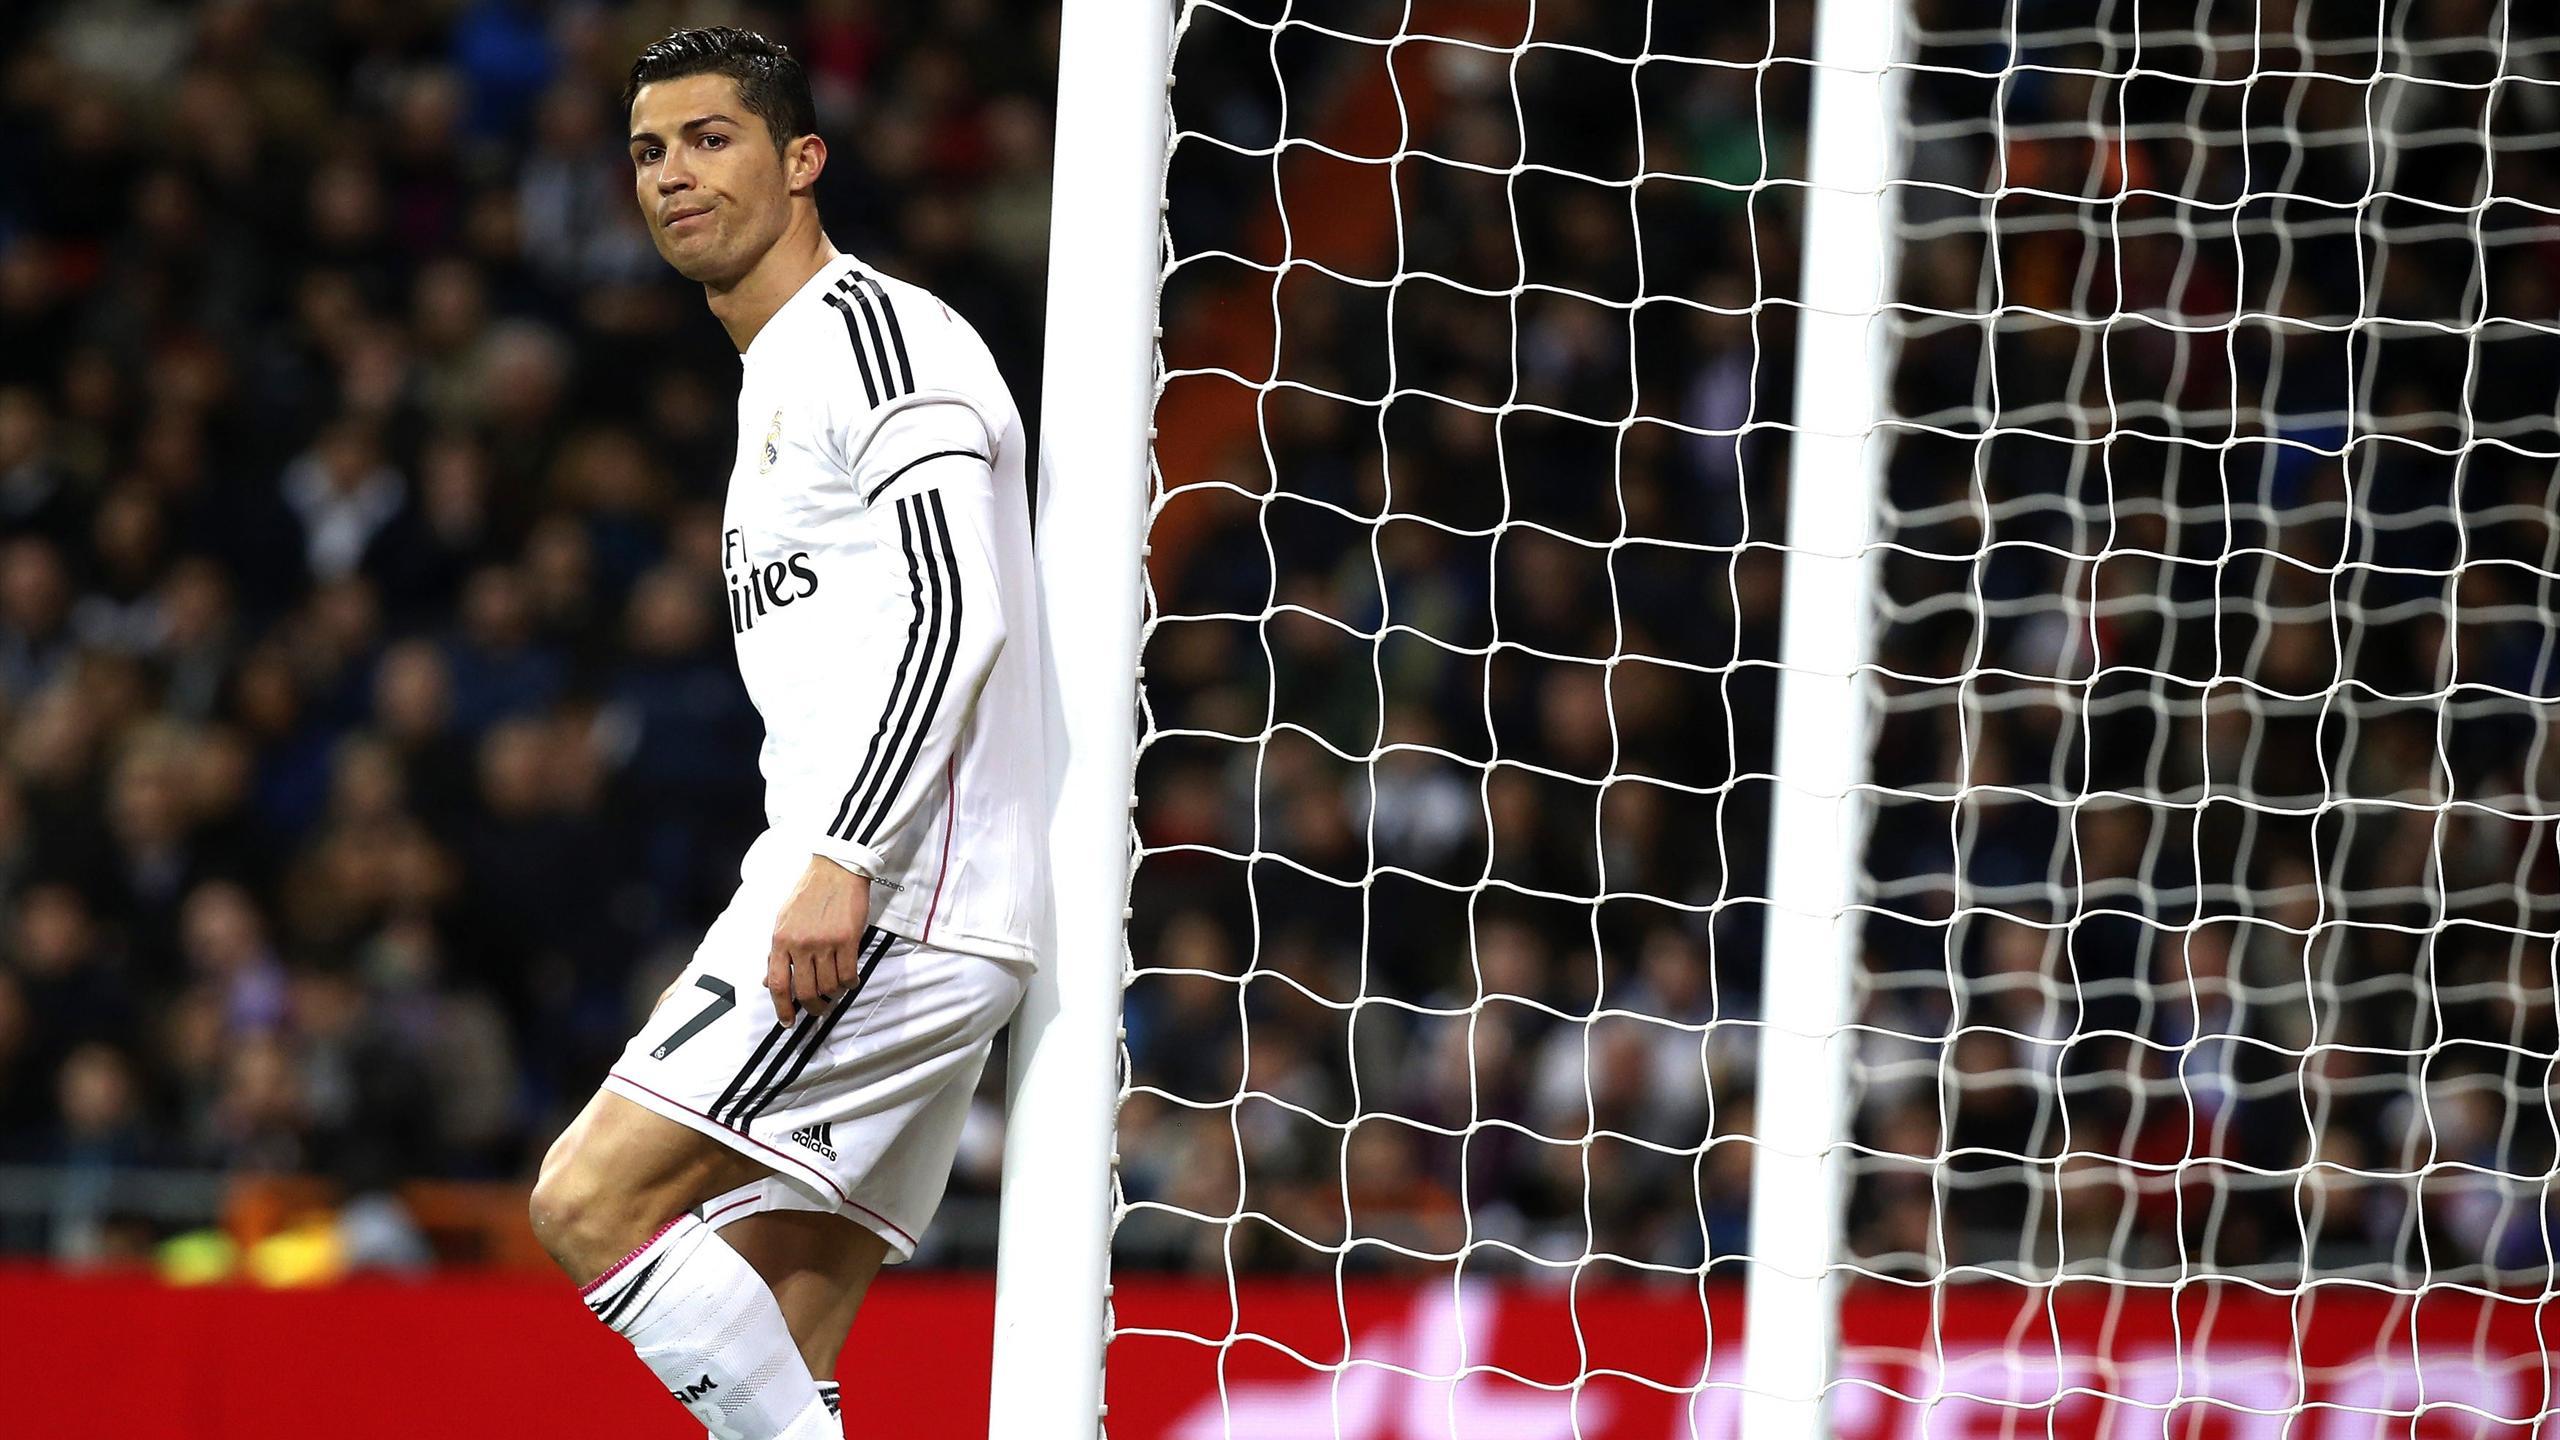 Cristiano Ronaldo reacts during the Liga match against Levante at Santiago Bernabeu.